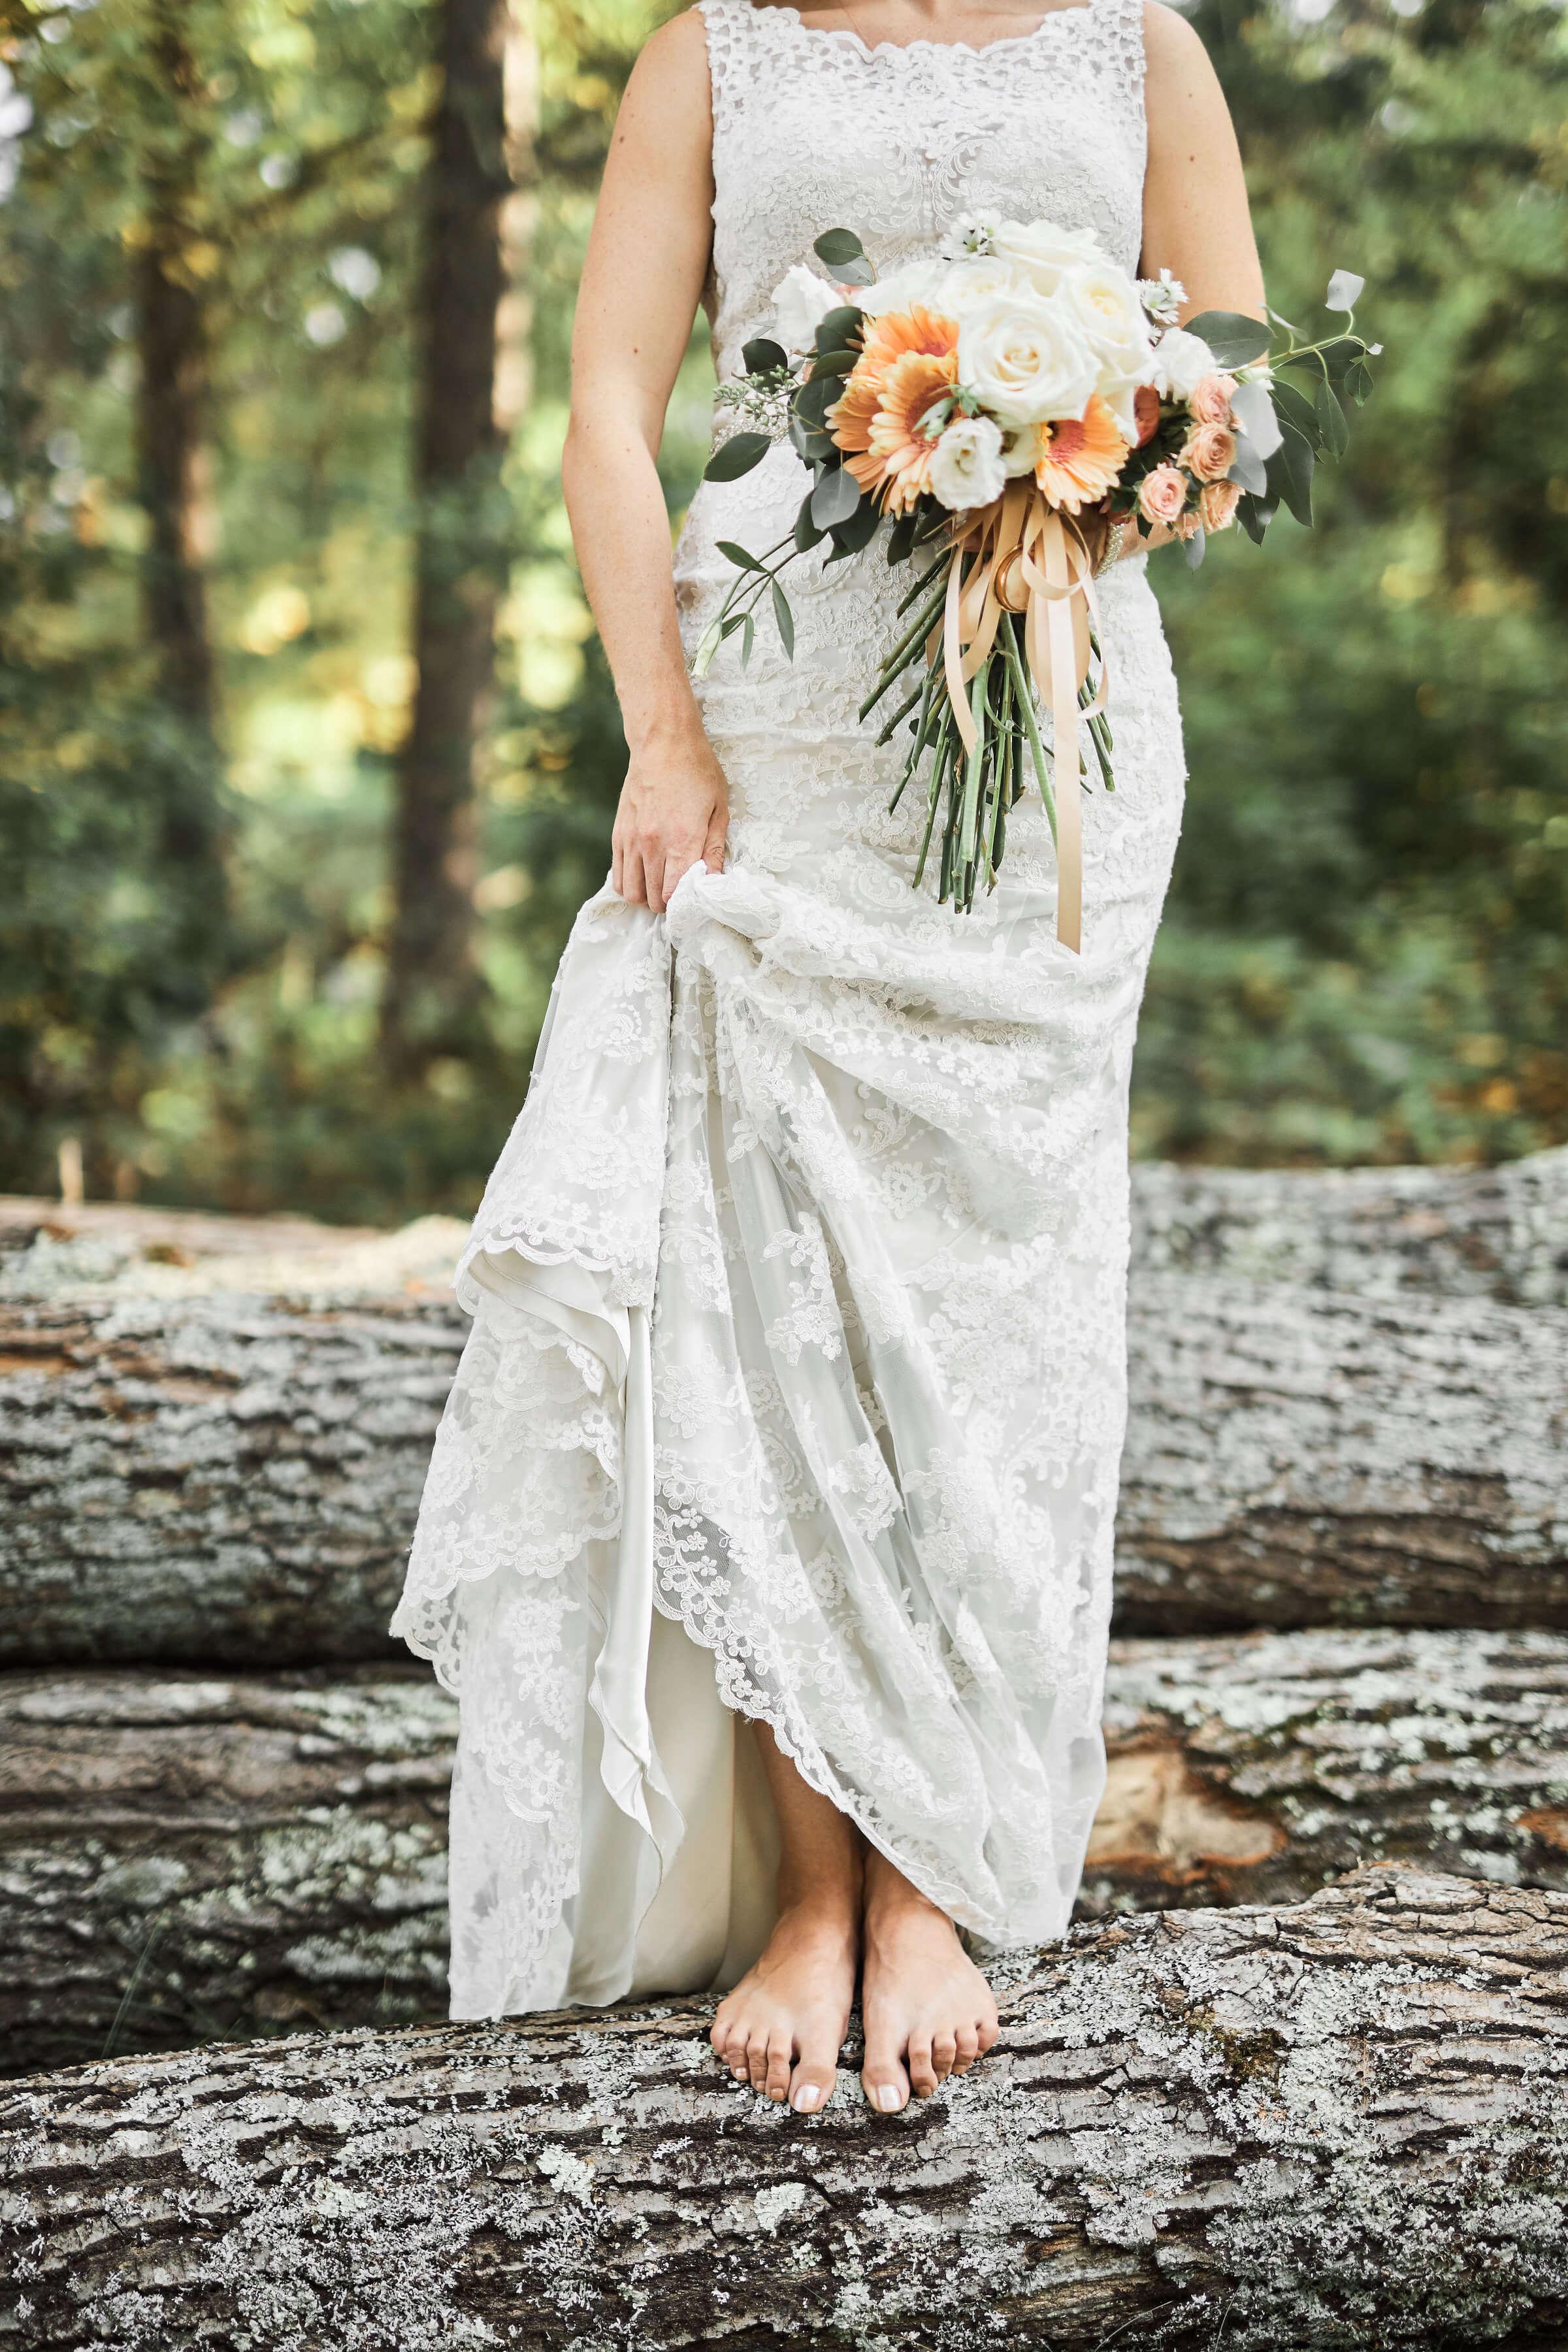 engle-olson-wedding-perry-james-photography-25.jpg